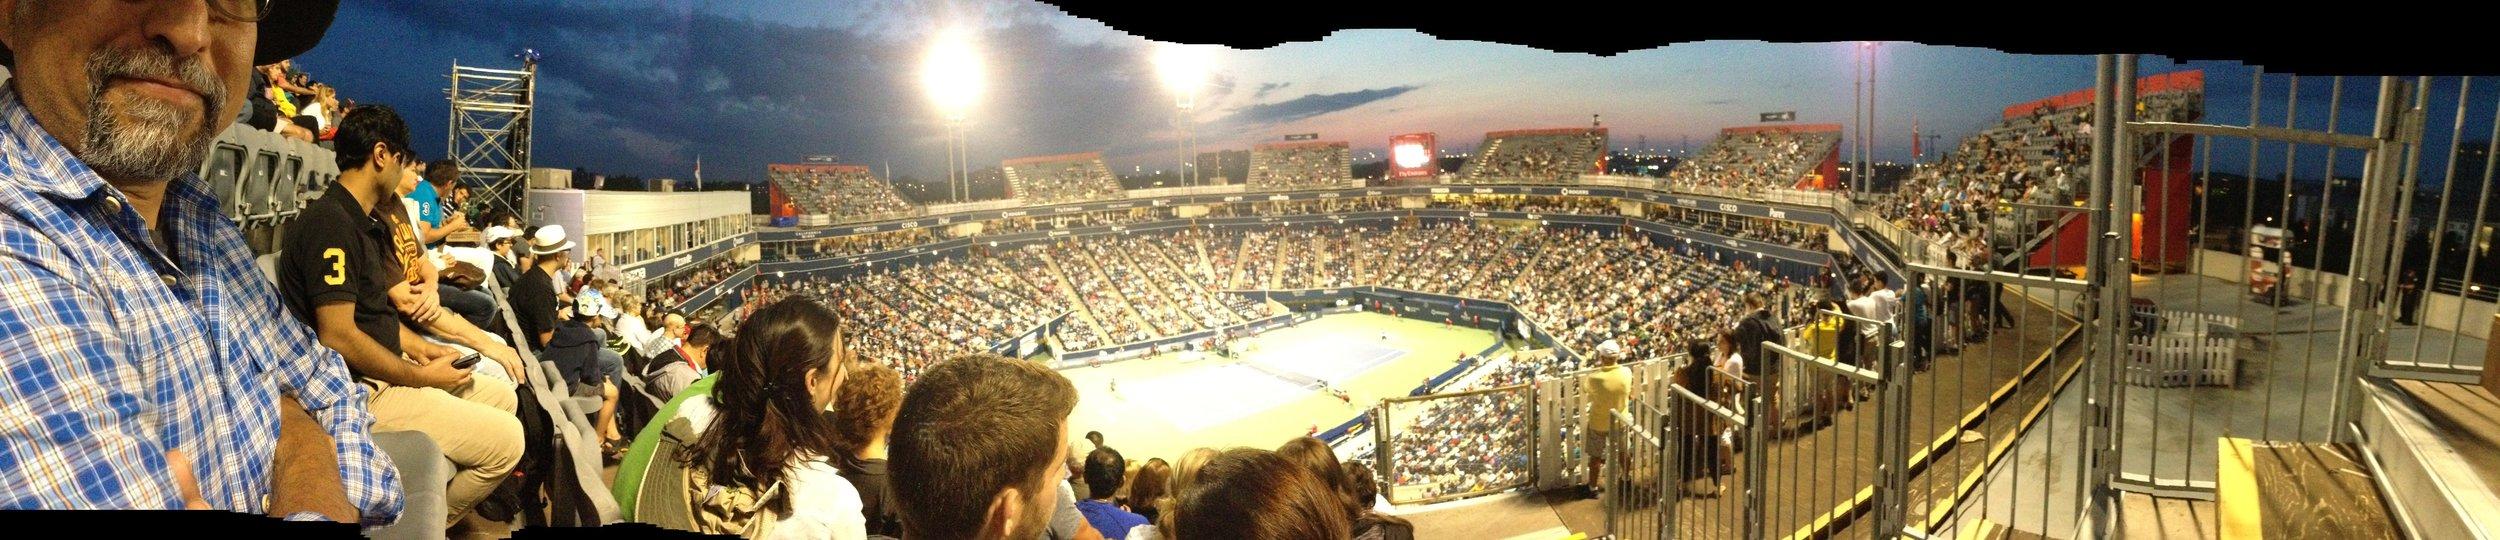 Ali Kazimi tennis Gary Popovich.jpg